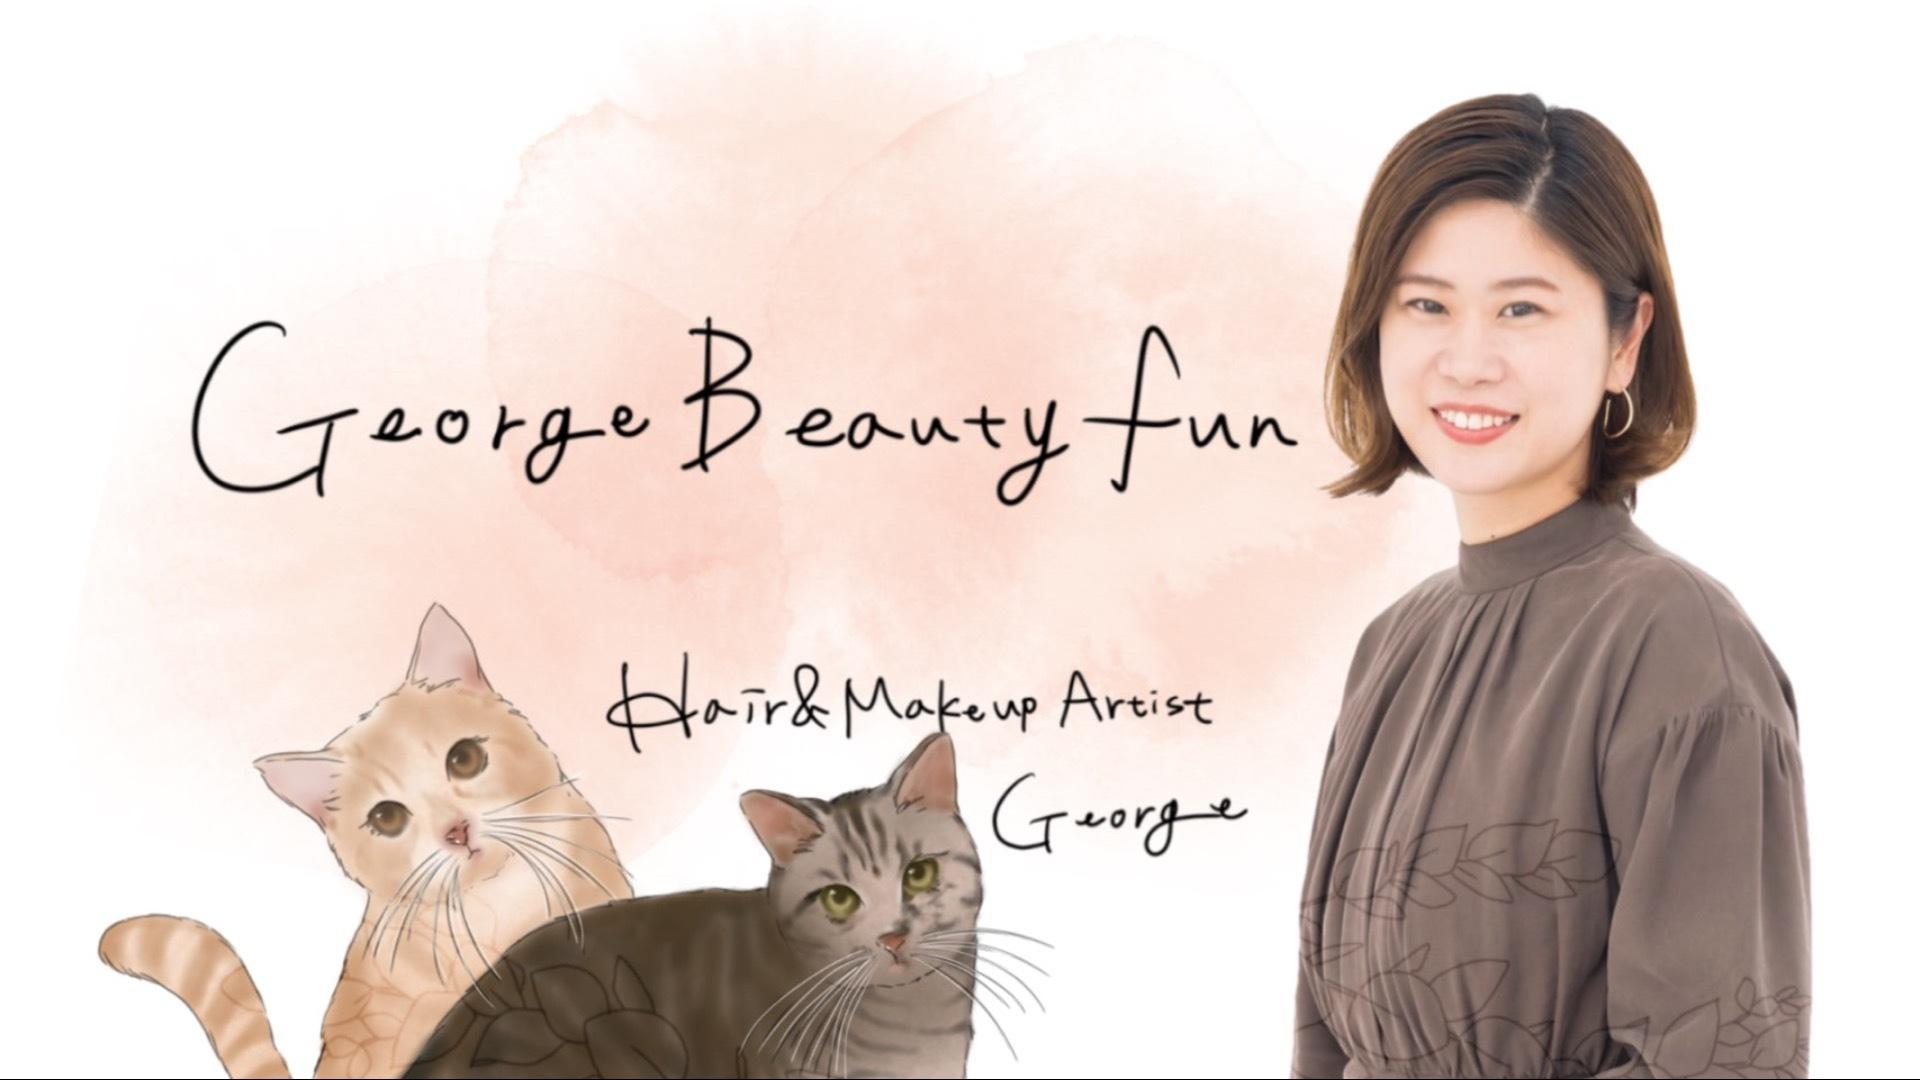 hairmakeupartist George - George Beauty Fun - DMM オンラインサロン